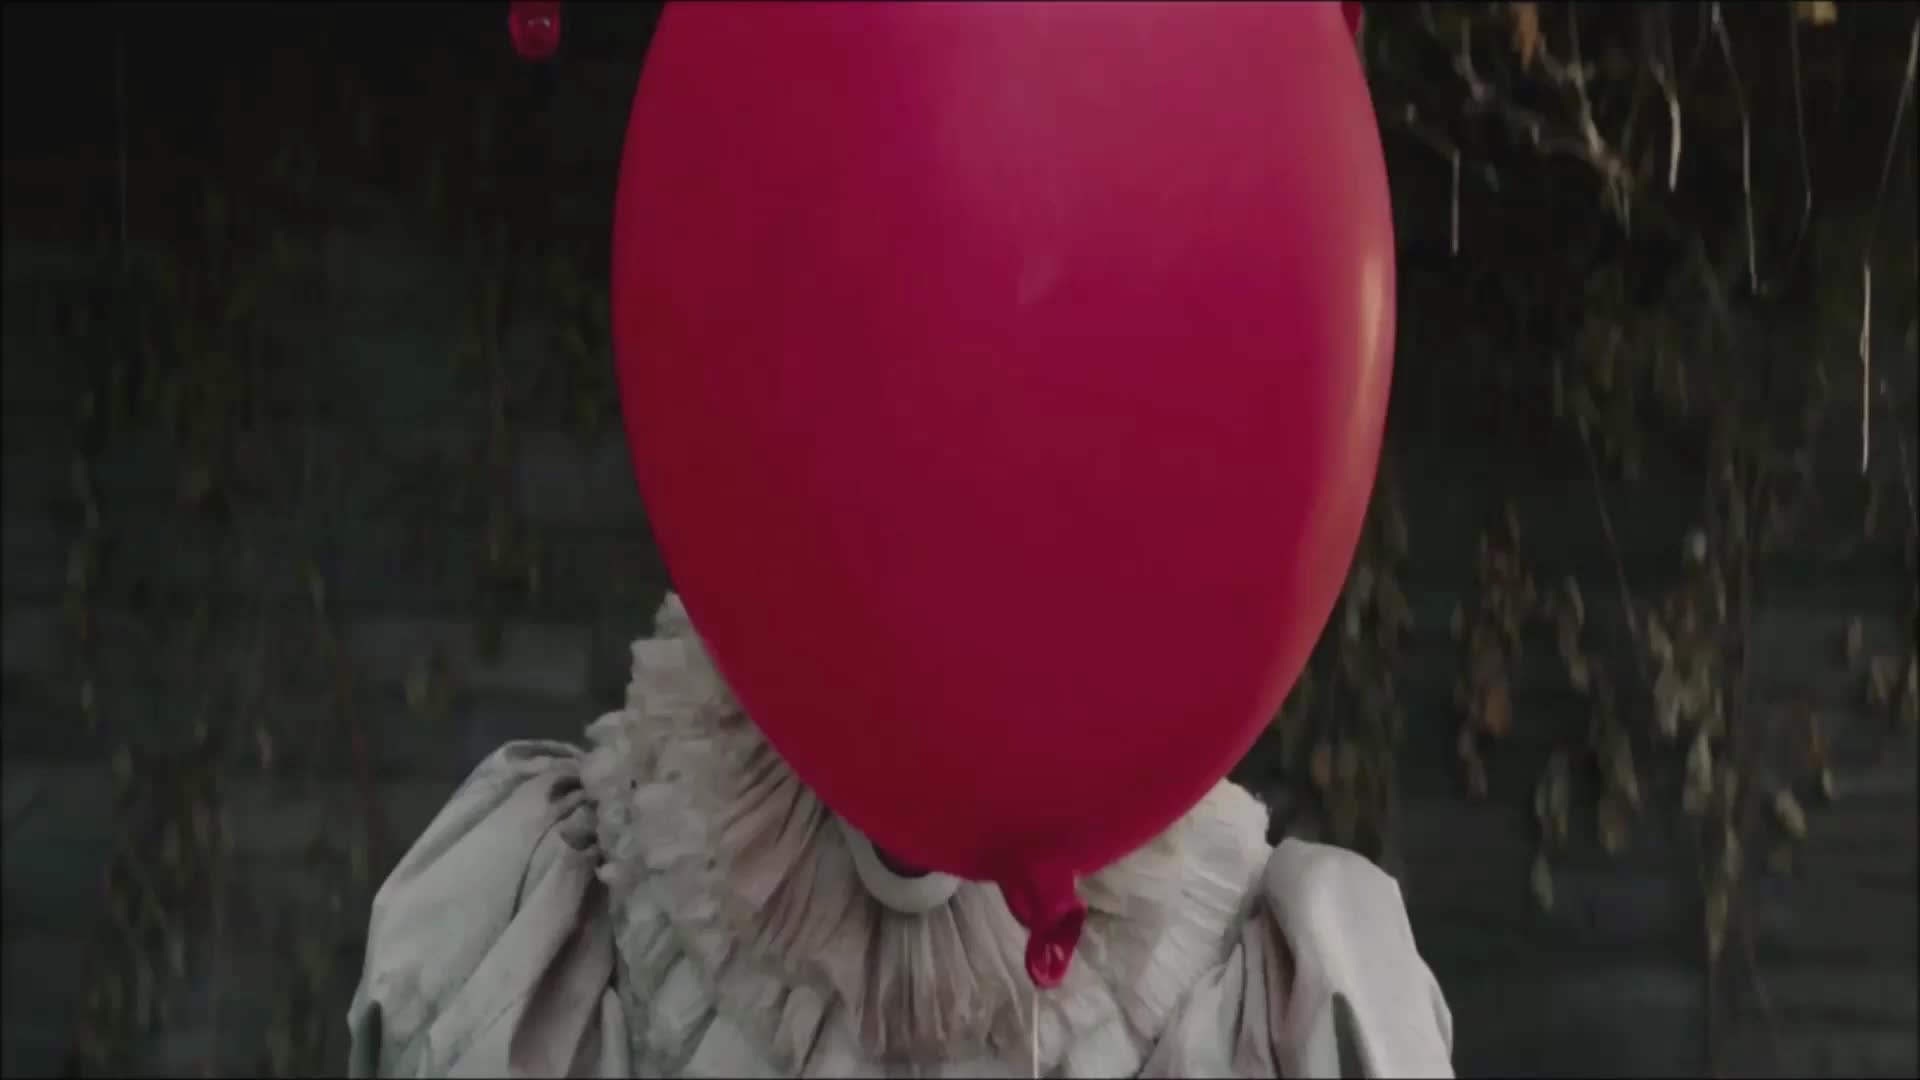 It, It Movie, WB, Warner Bros., WarnerBros, balloon, it, it movie, movies, warner bros., warnerbros, wb, Balloon smile GIFs